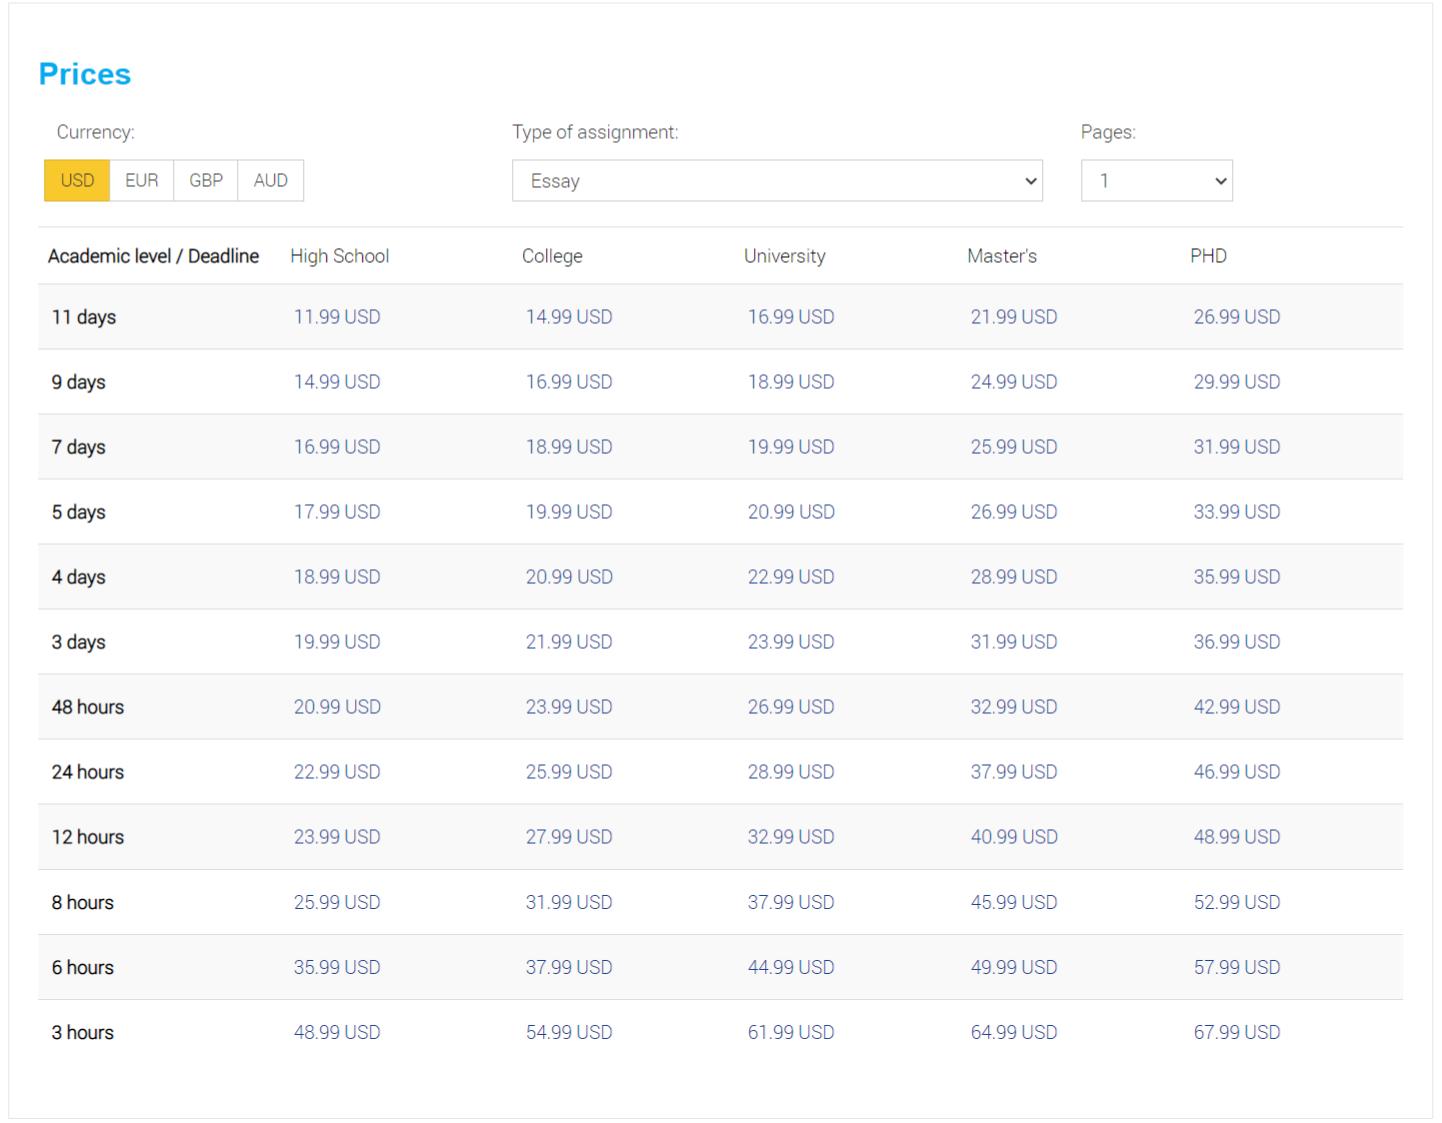 prices list